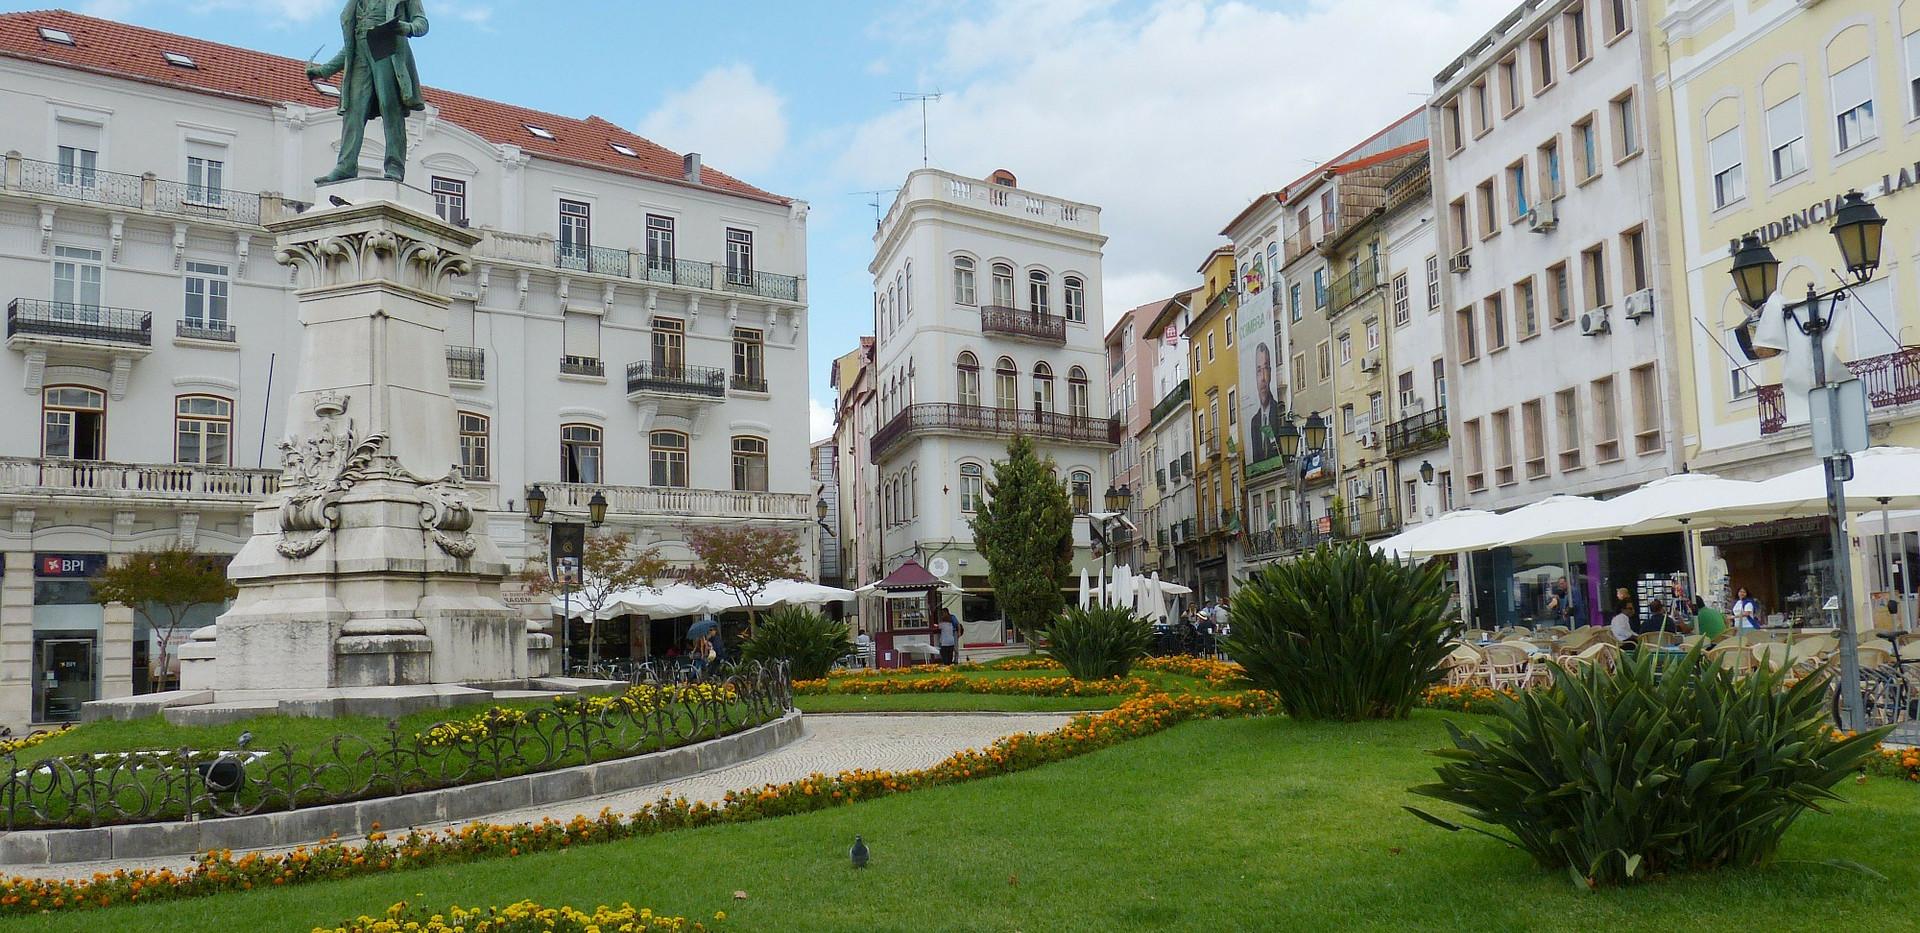 Cidade de Coimbra, Portugal